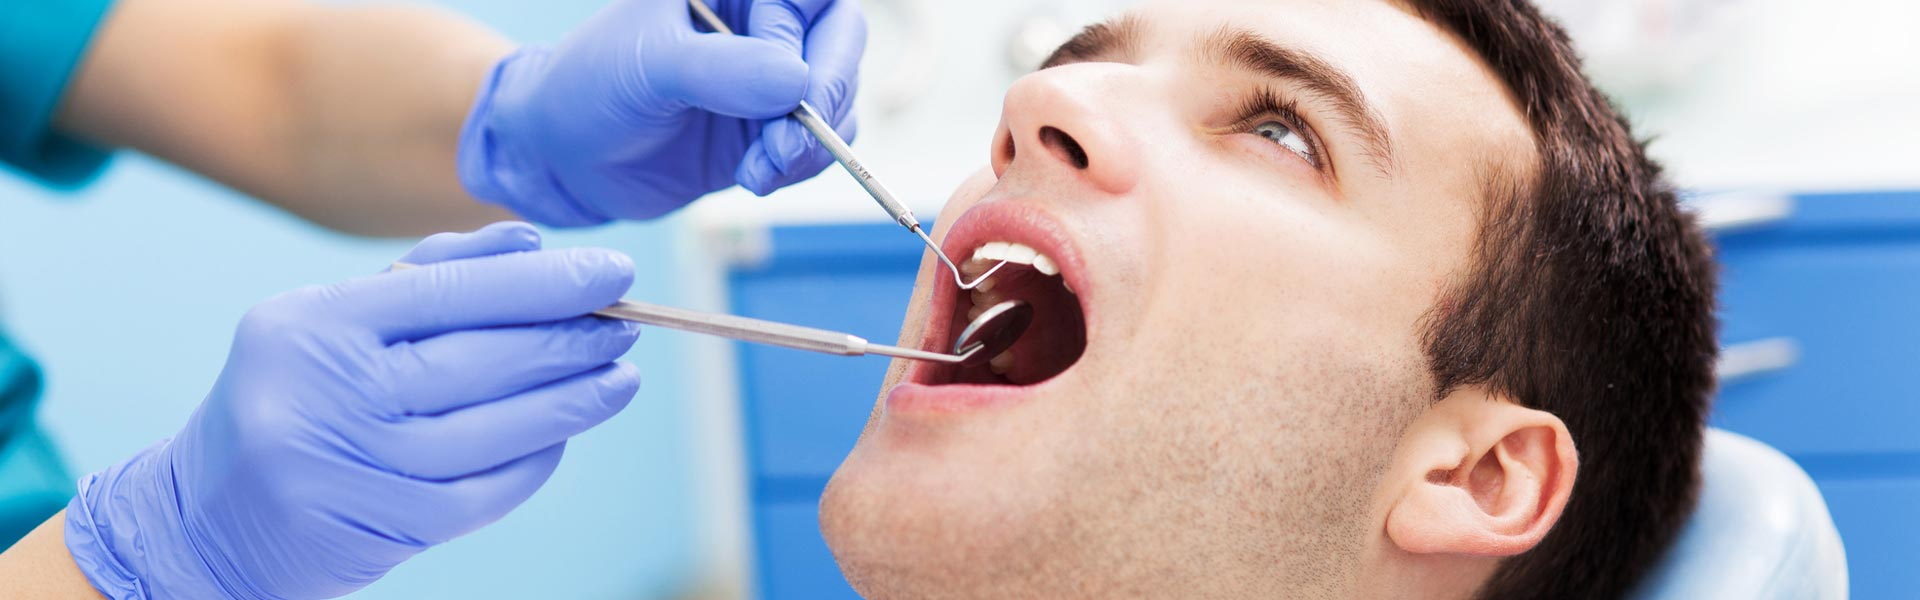 Dentist examining patient for dental surgery